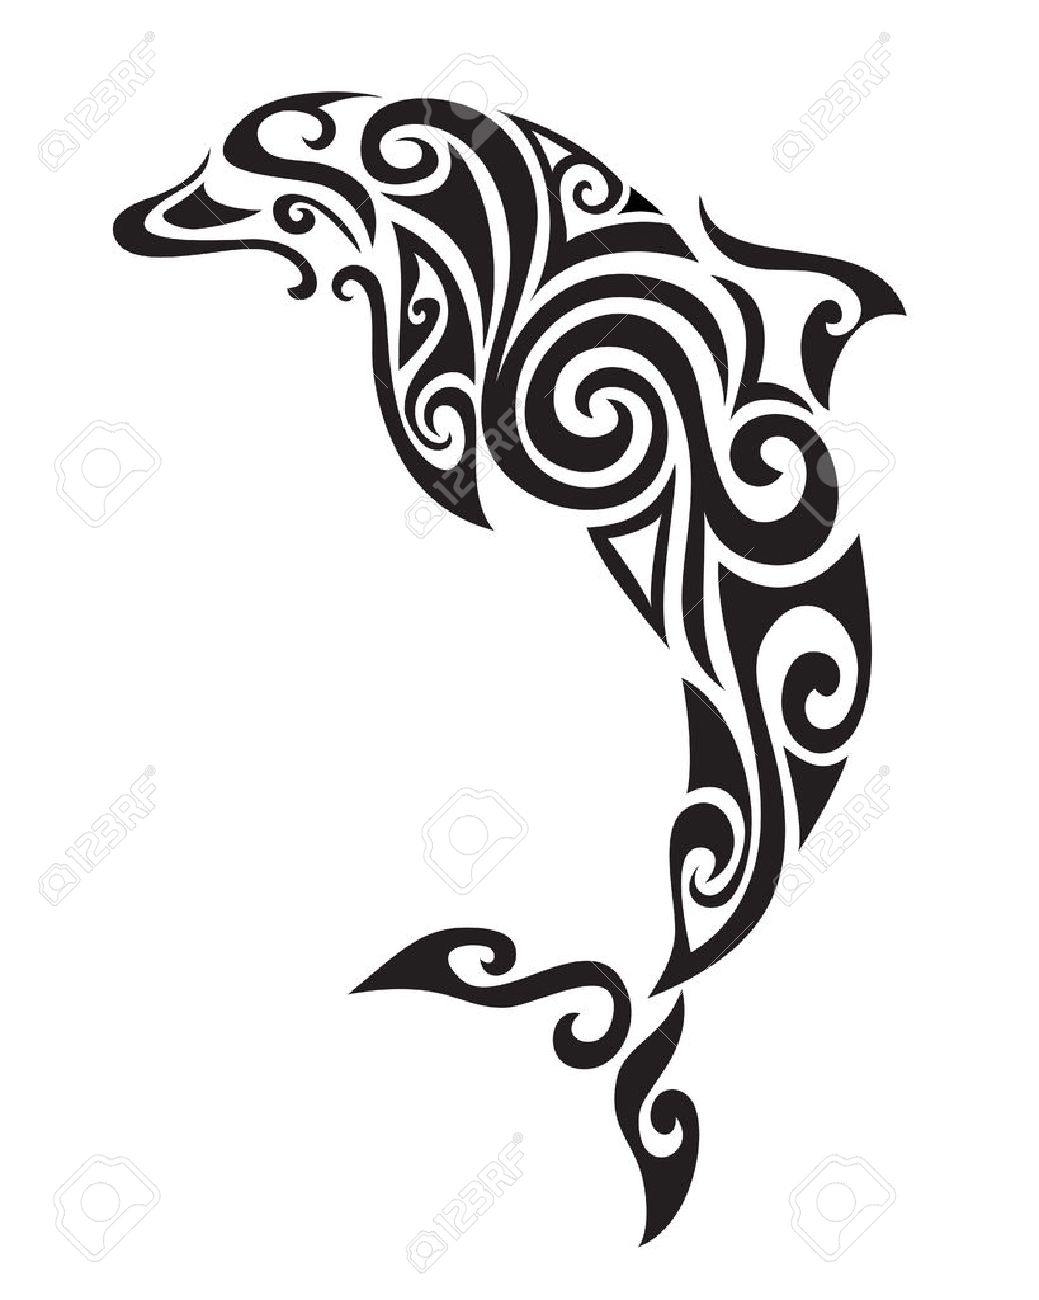 Decorative ornamental dolphin silhouette. vector illustration background. - 52442184